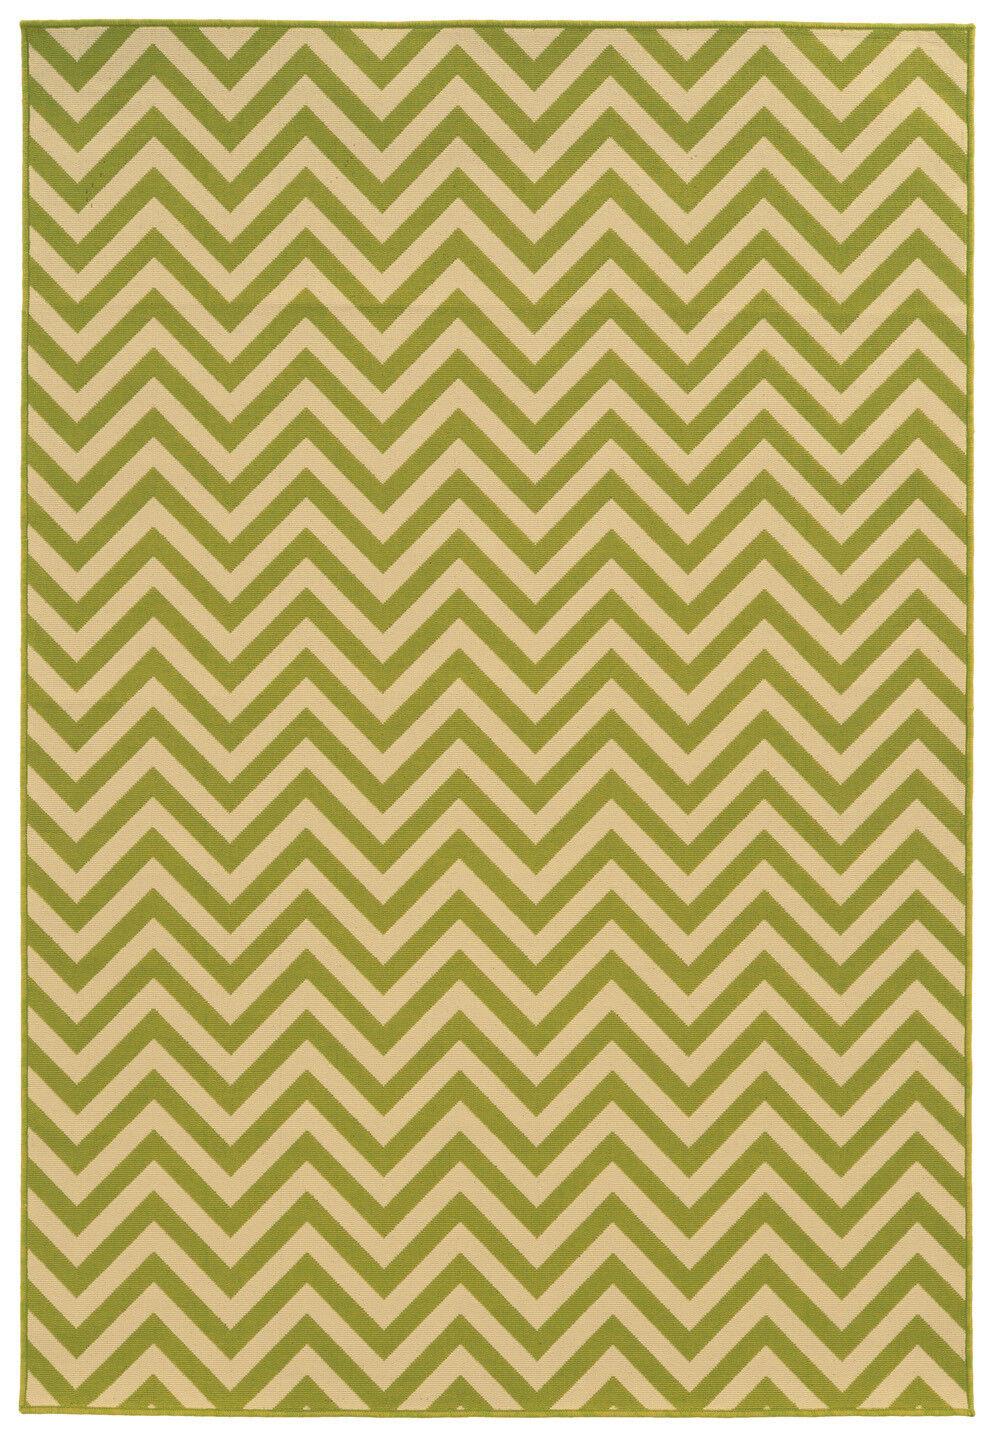 2'x8' Sphinx Geometric Geometric Geometric Ivory Stripes Chevron 4593K Runner - Aprx 2' 3  x 7' 6  ab2dee